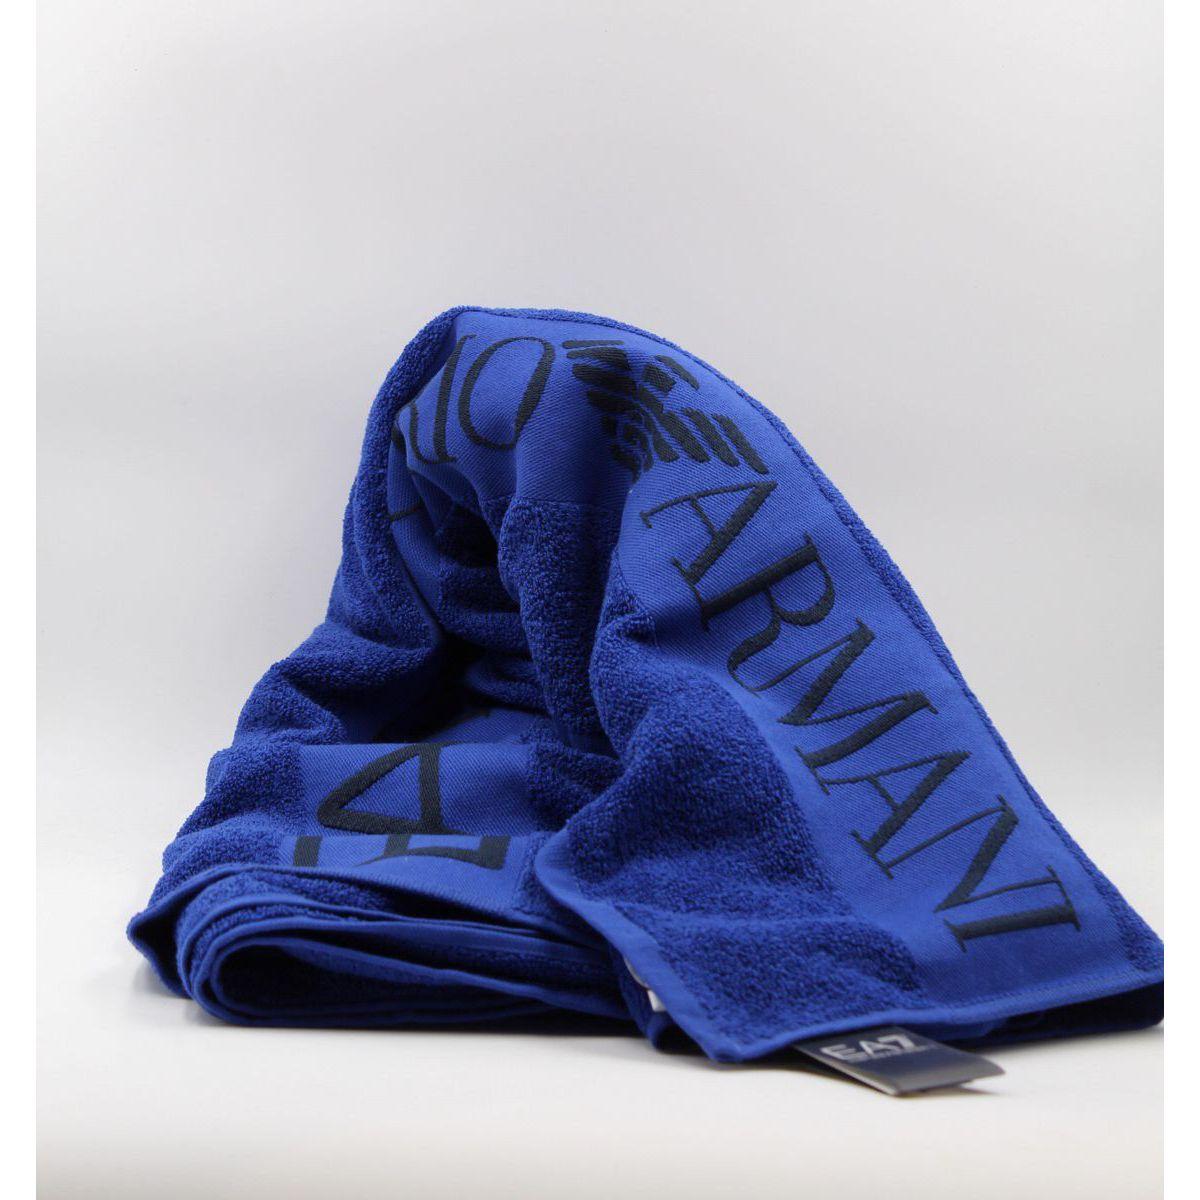 EA7 towel Light blue Emporio Armani